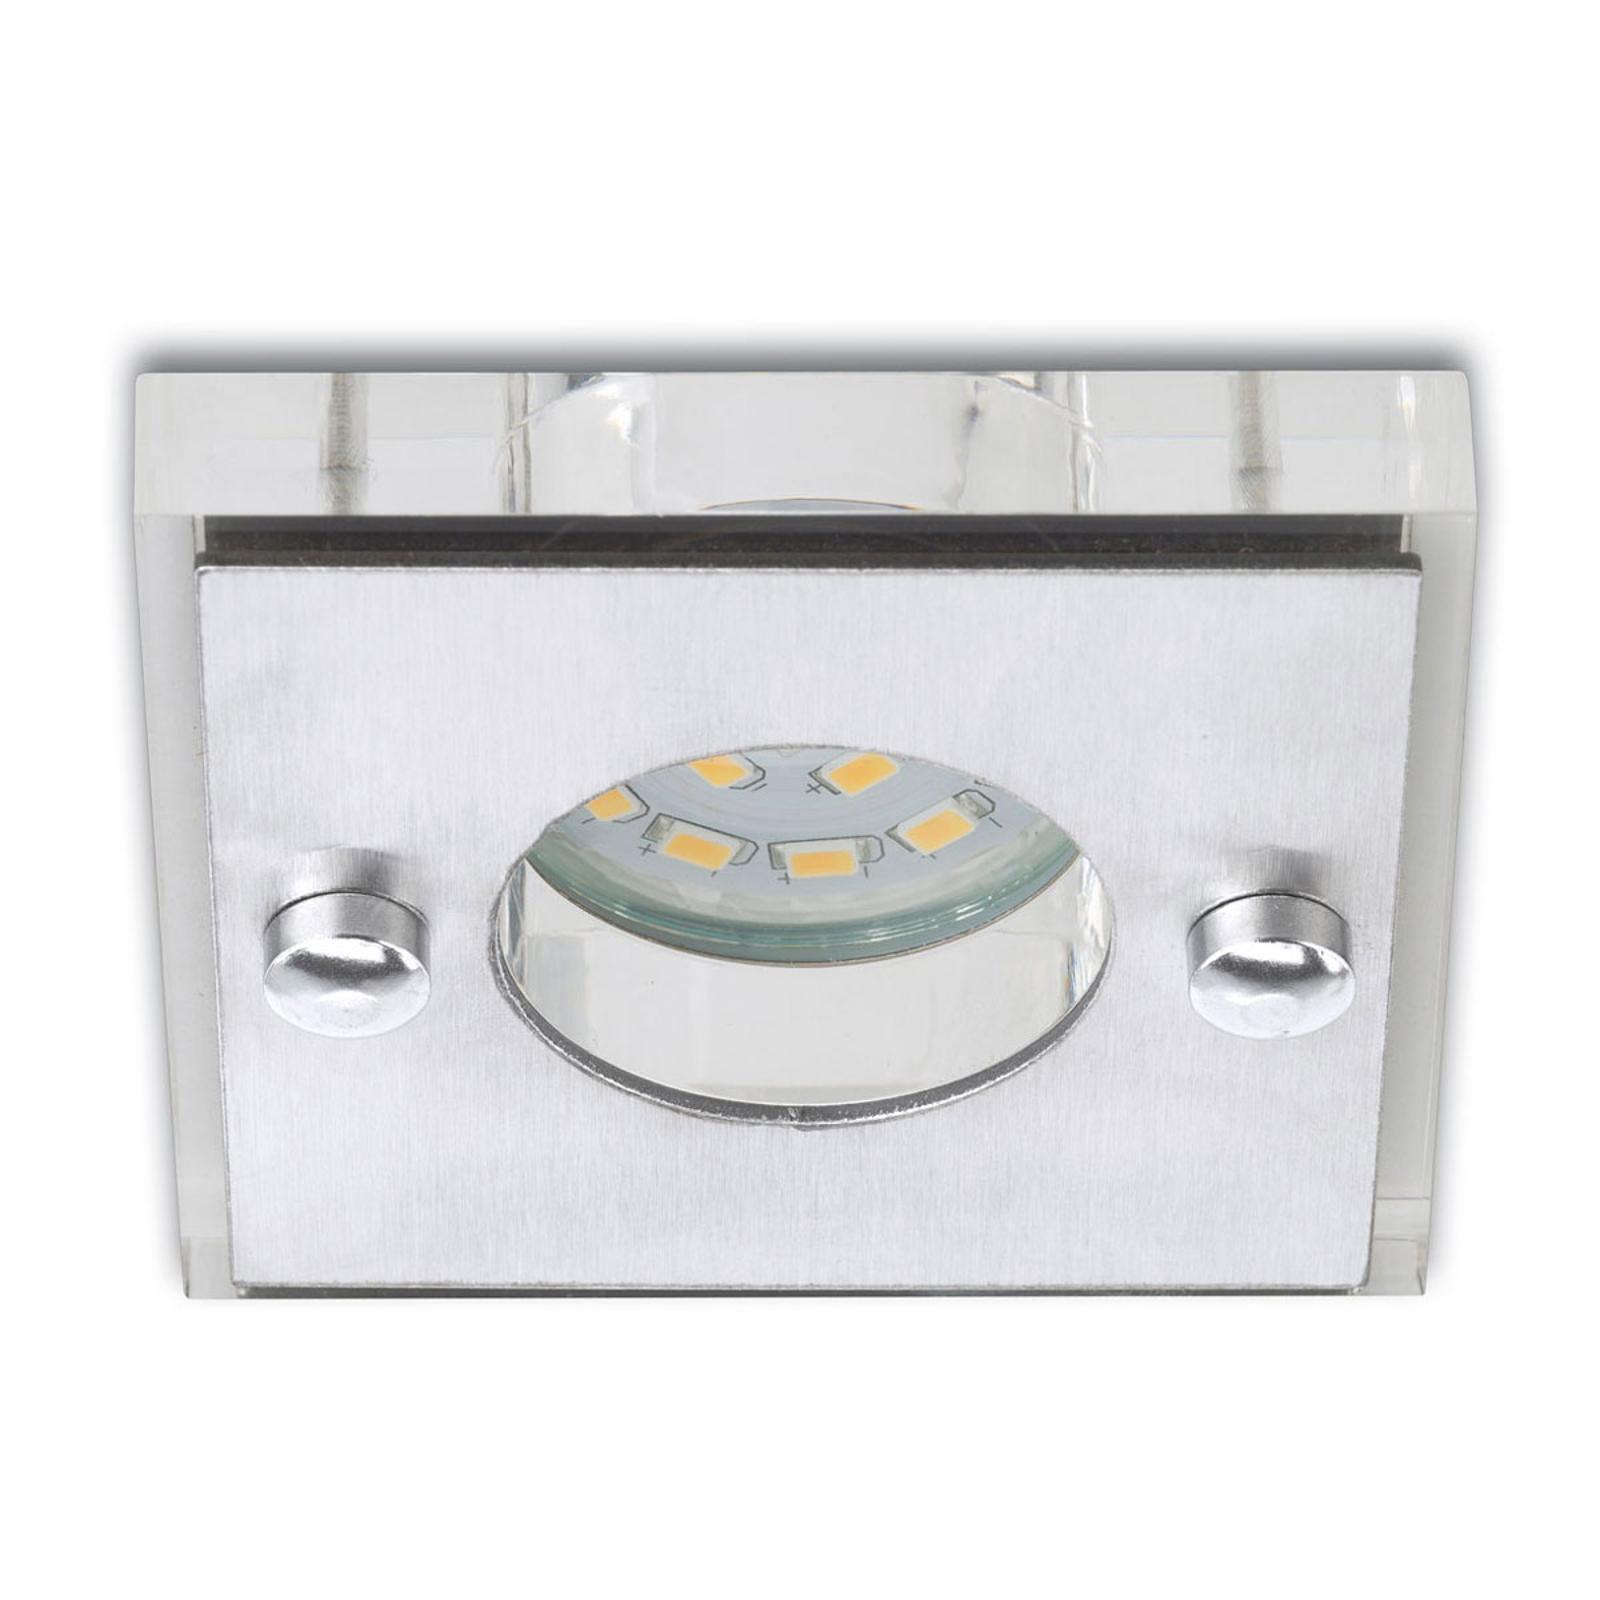 Quadratisch - LED-Einbaustrahler Nikas matt-nickel